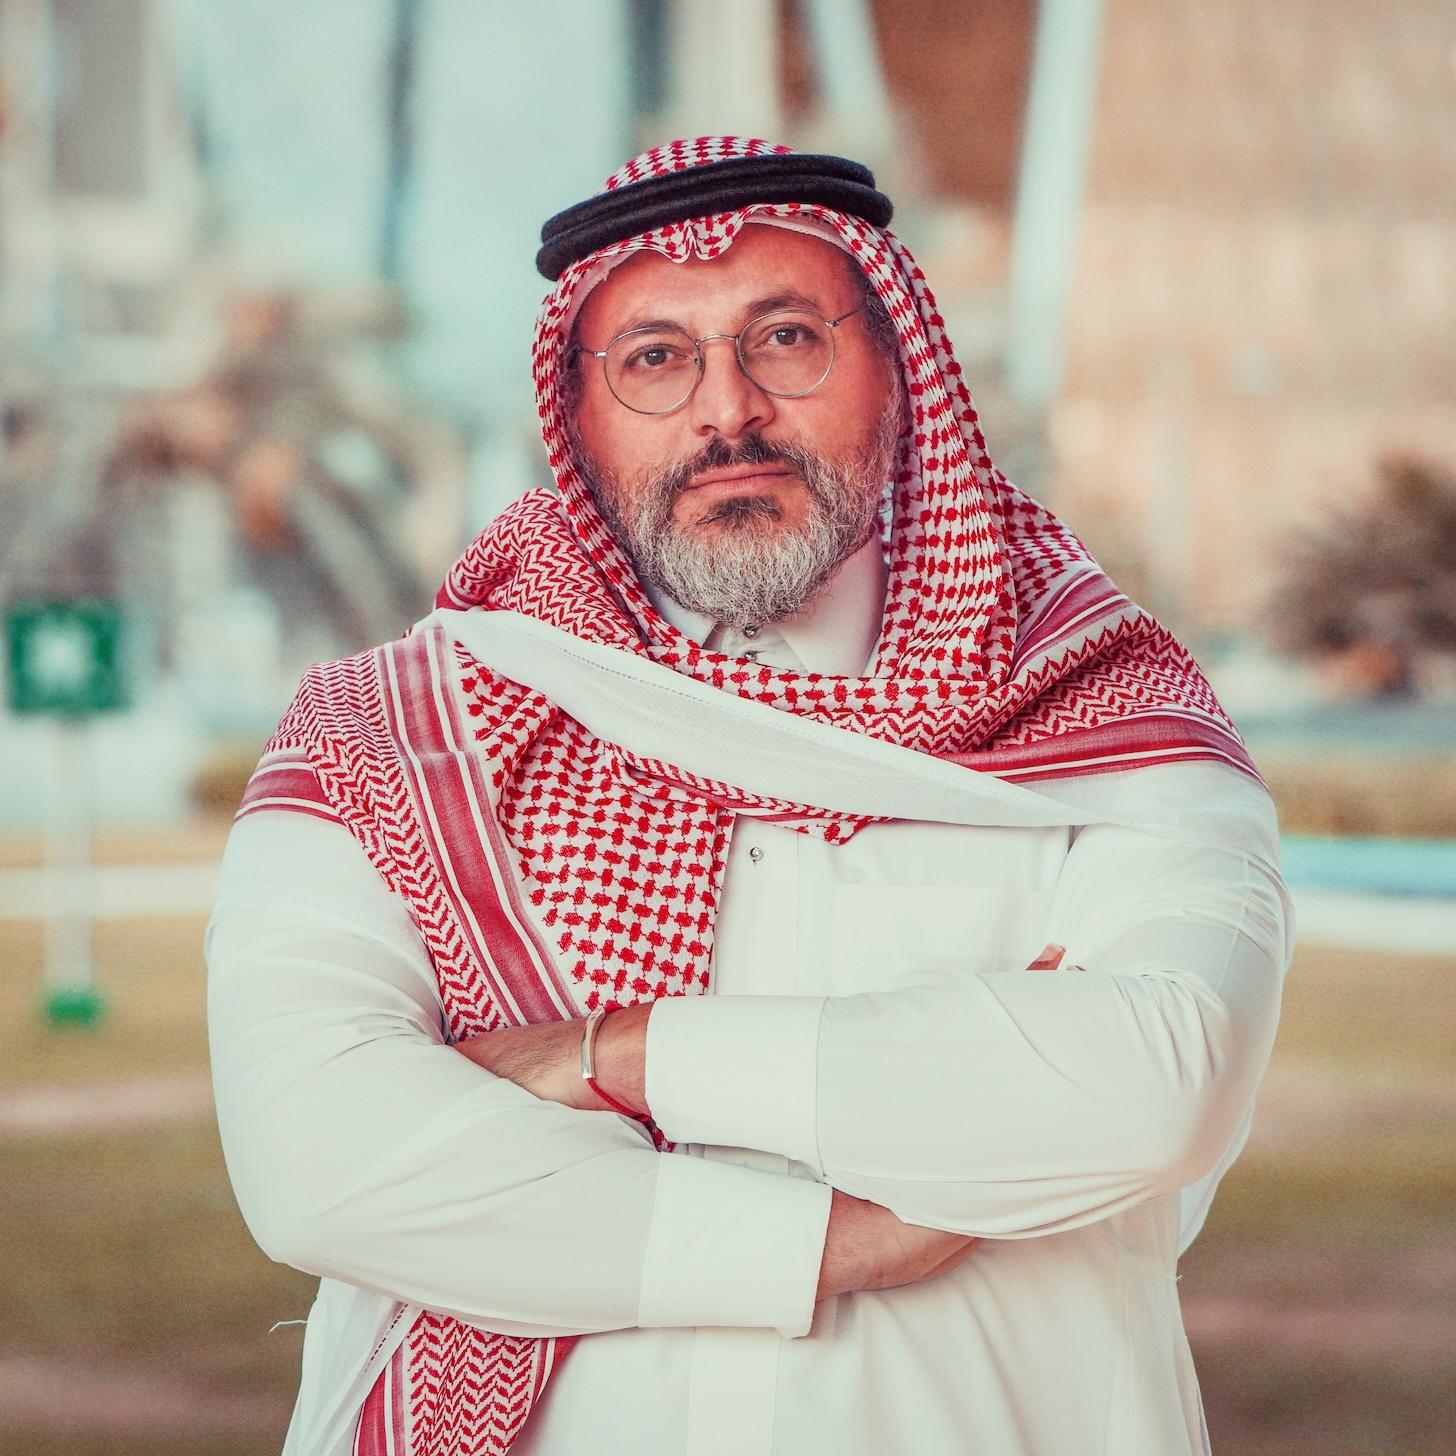 webedia-arabia-a-new-arabic-media-and-entertainment-powerhouse-in-the-region